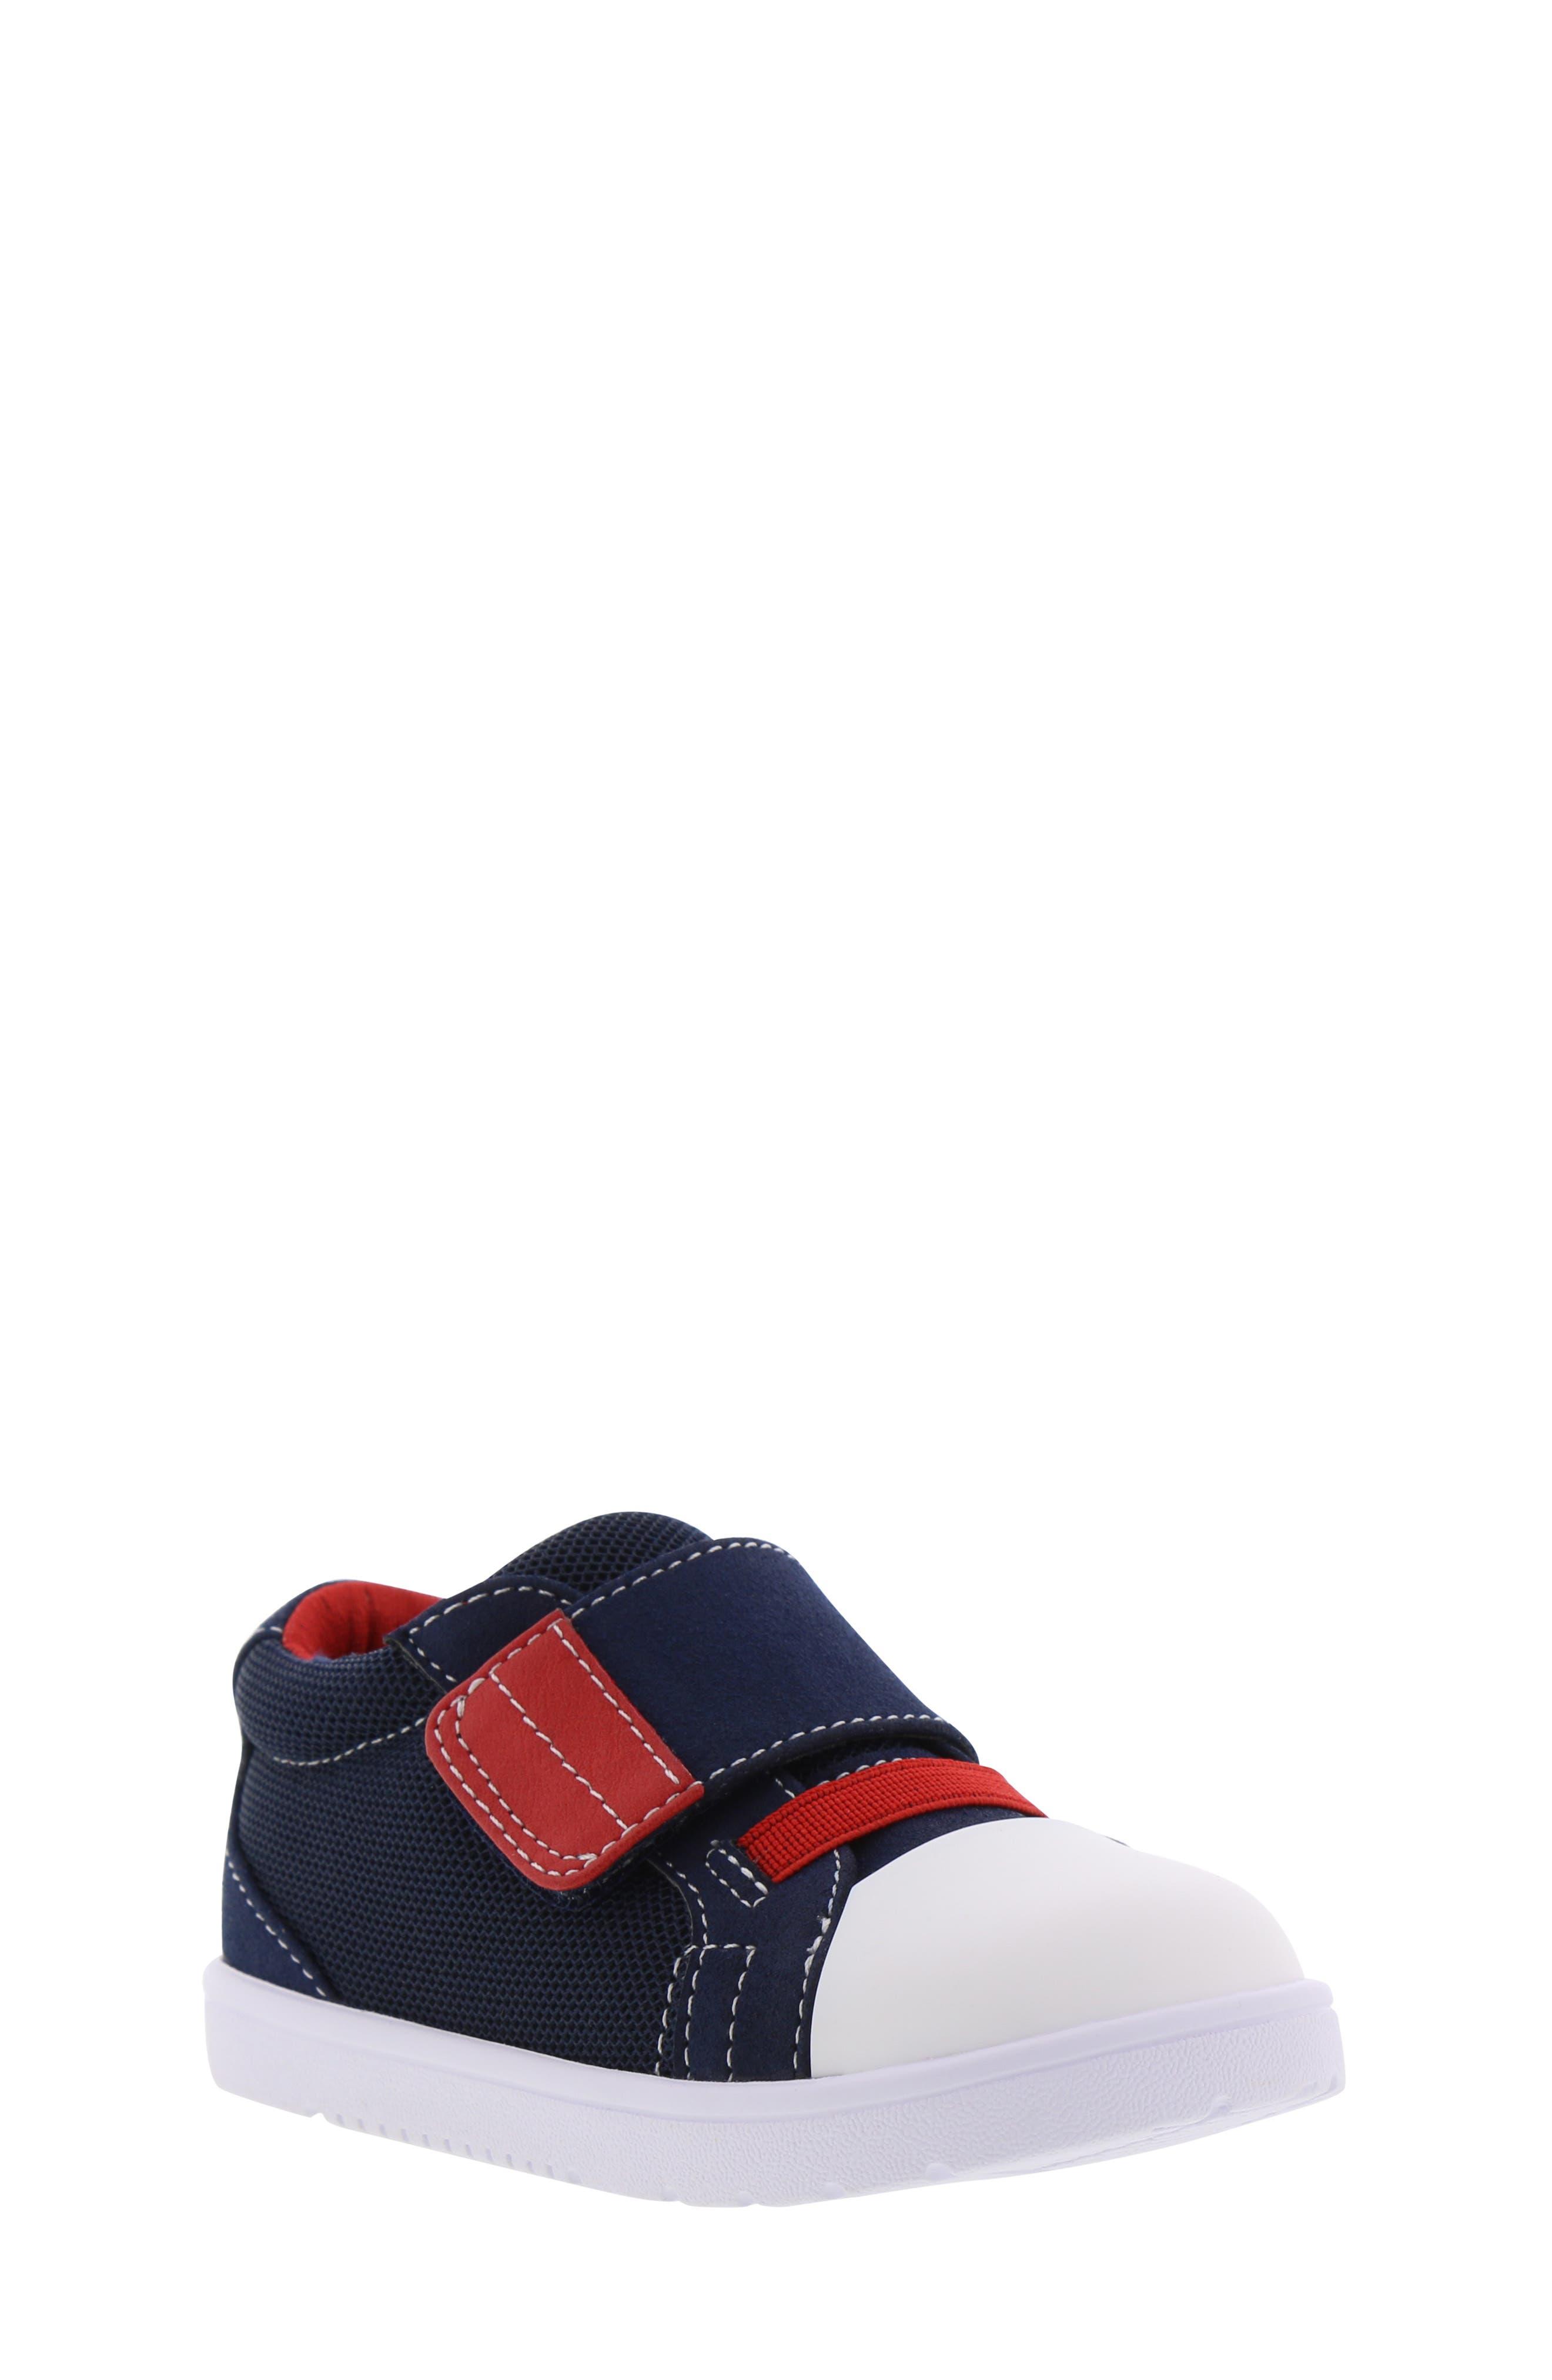 BØRN Bailey Clark Sneaker, Main, color, NAVY